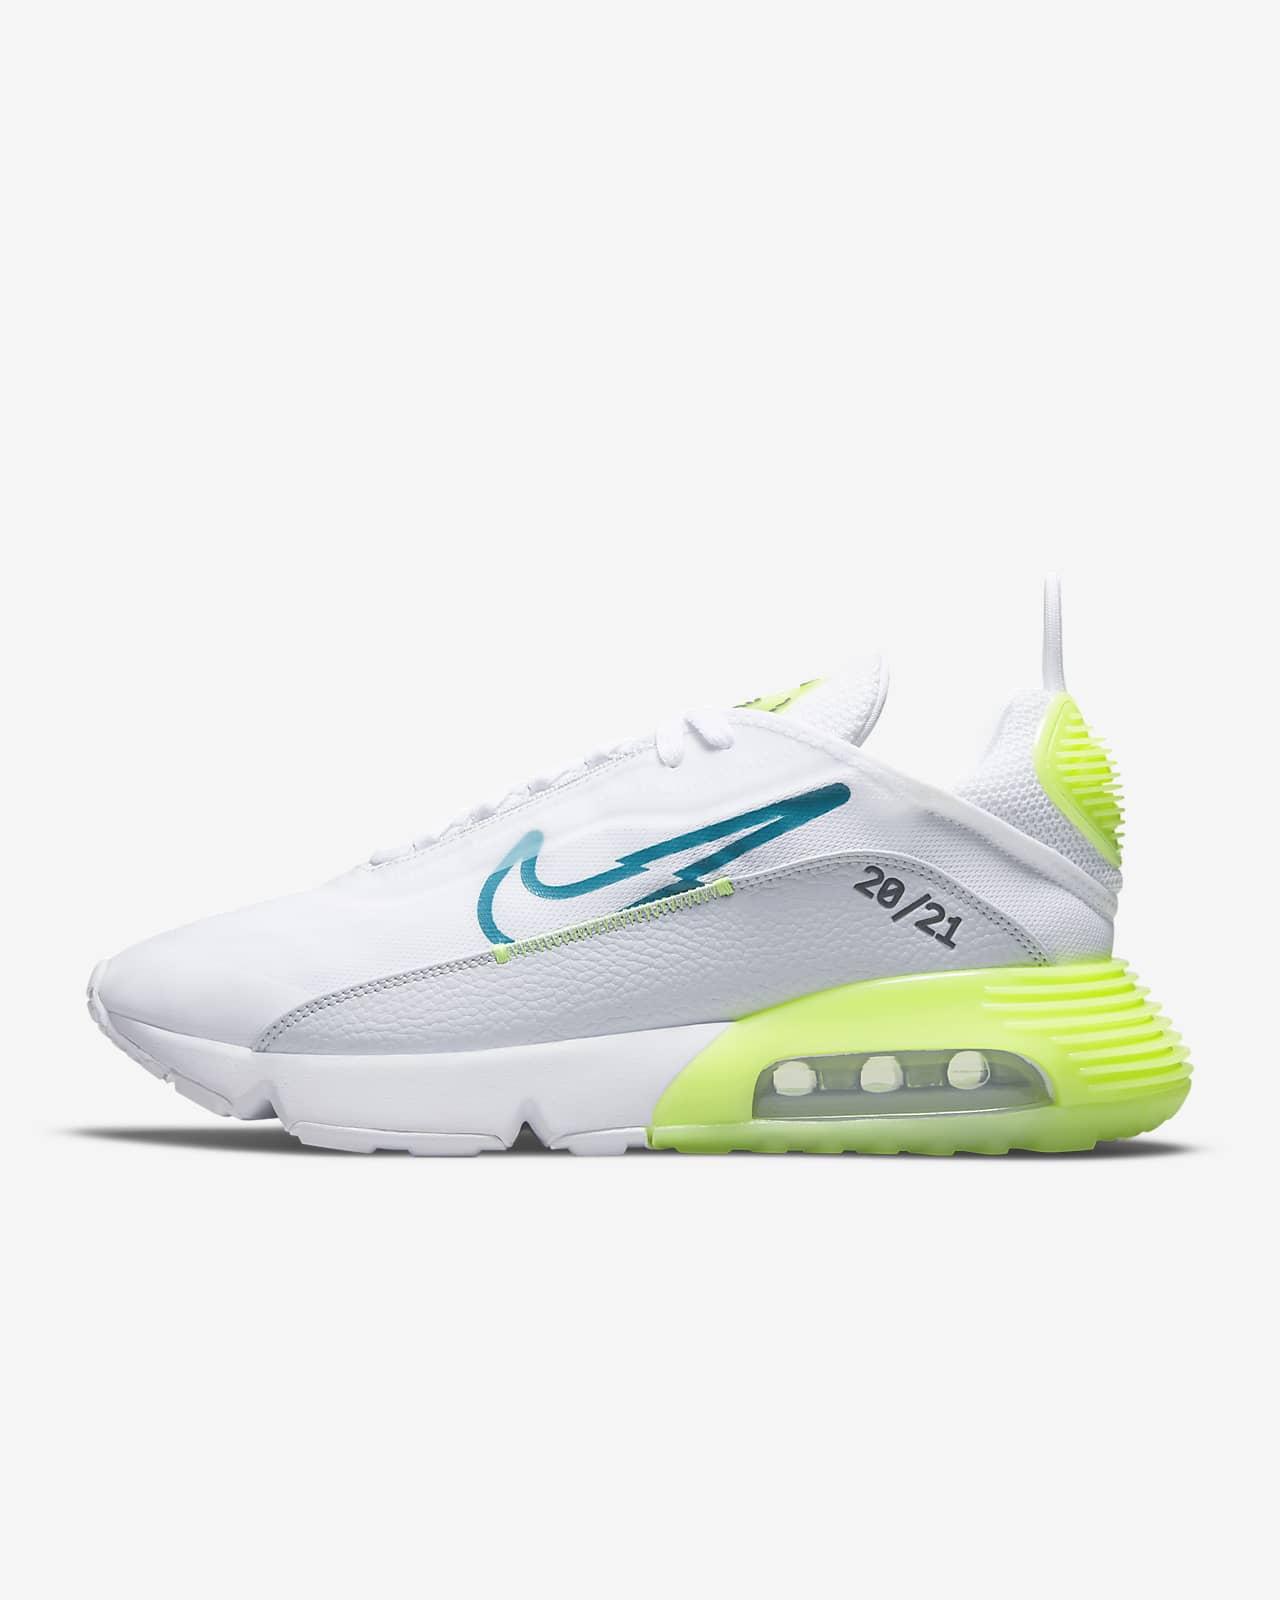 Chaussure Nike Air Max 2090 pour Homme